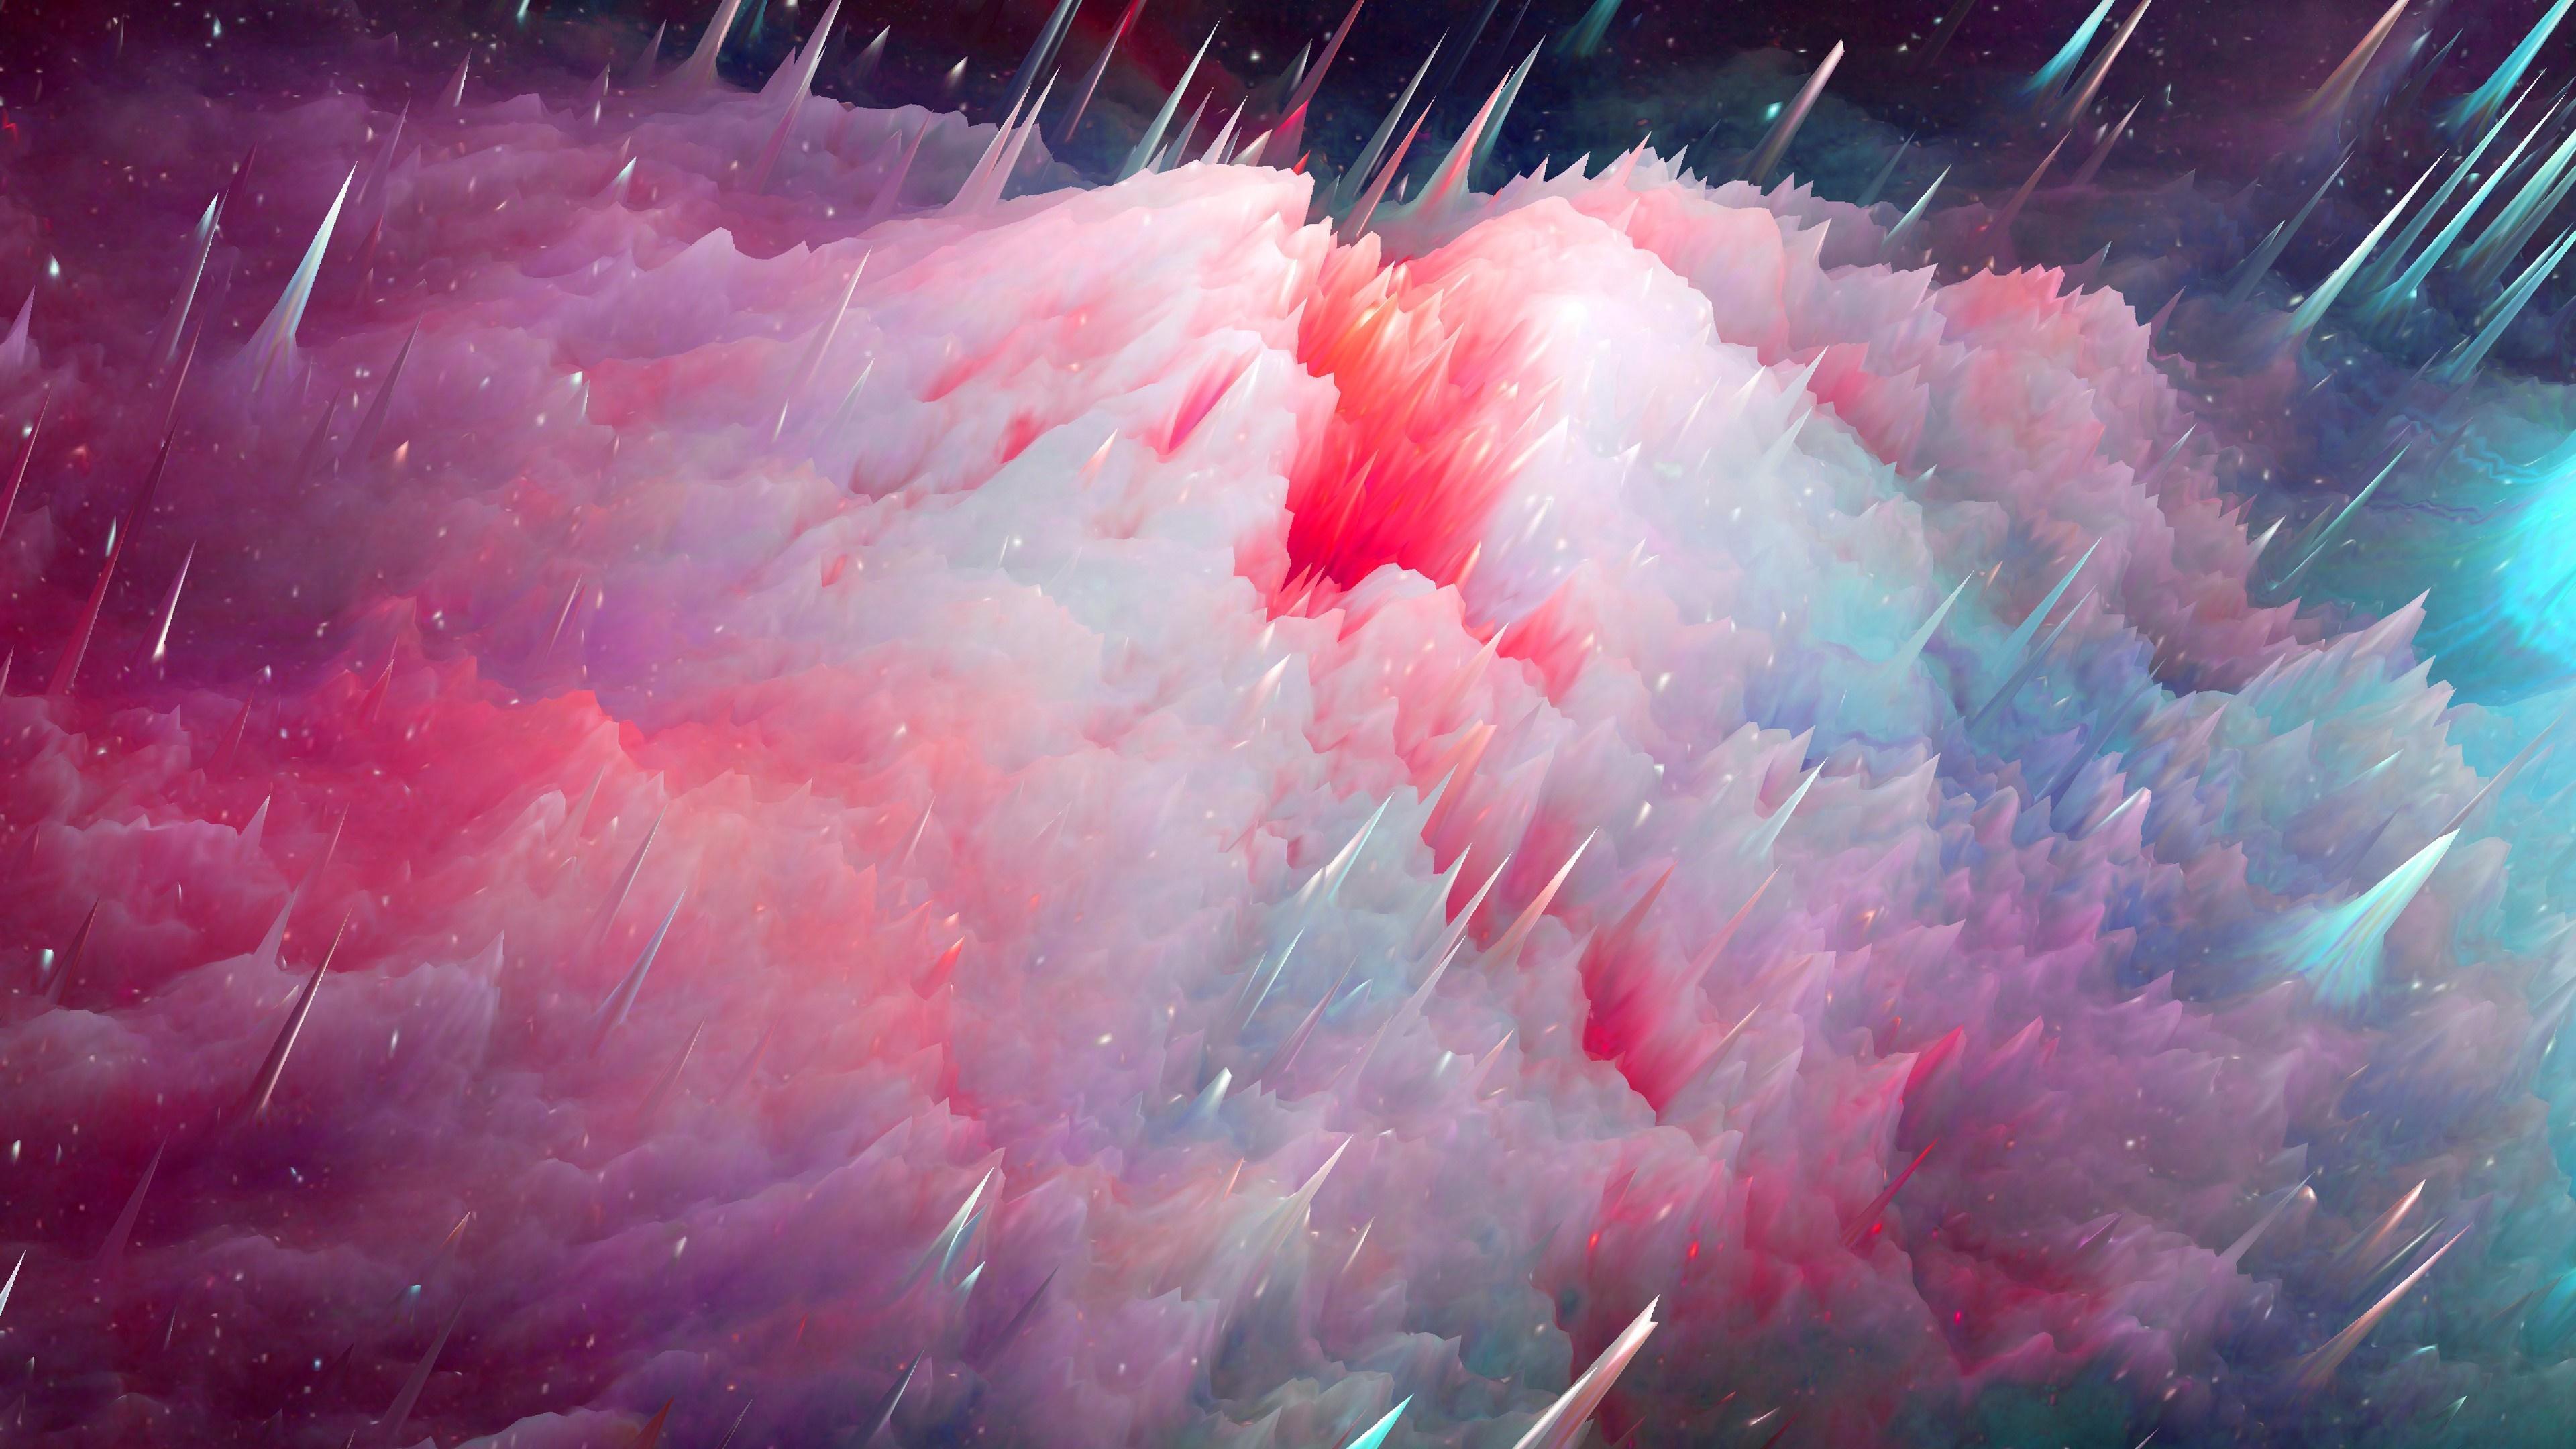 Prickly abstract art wallpaper